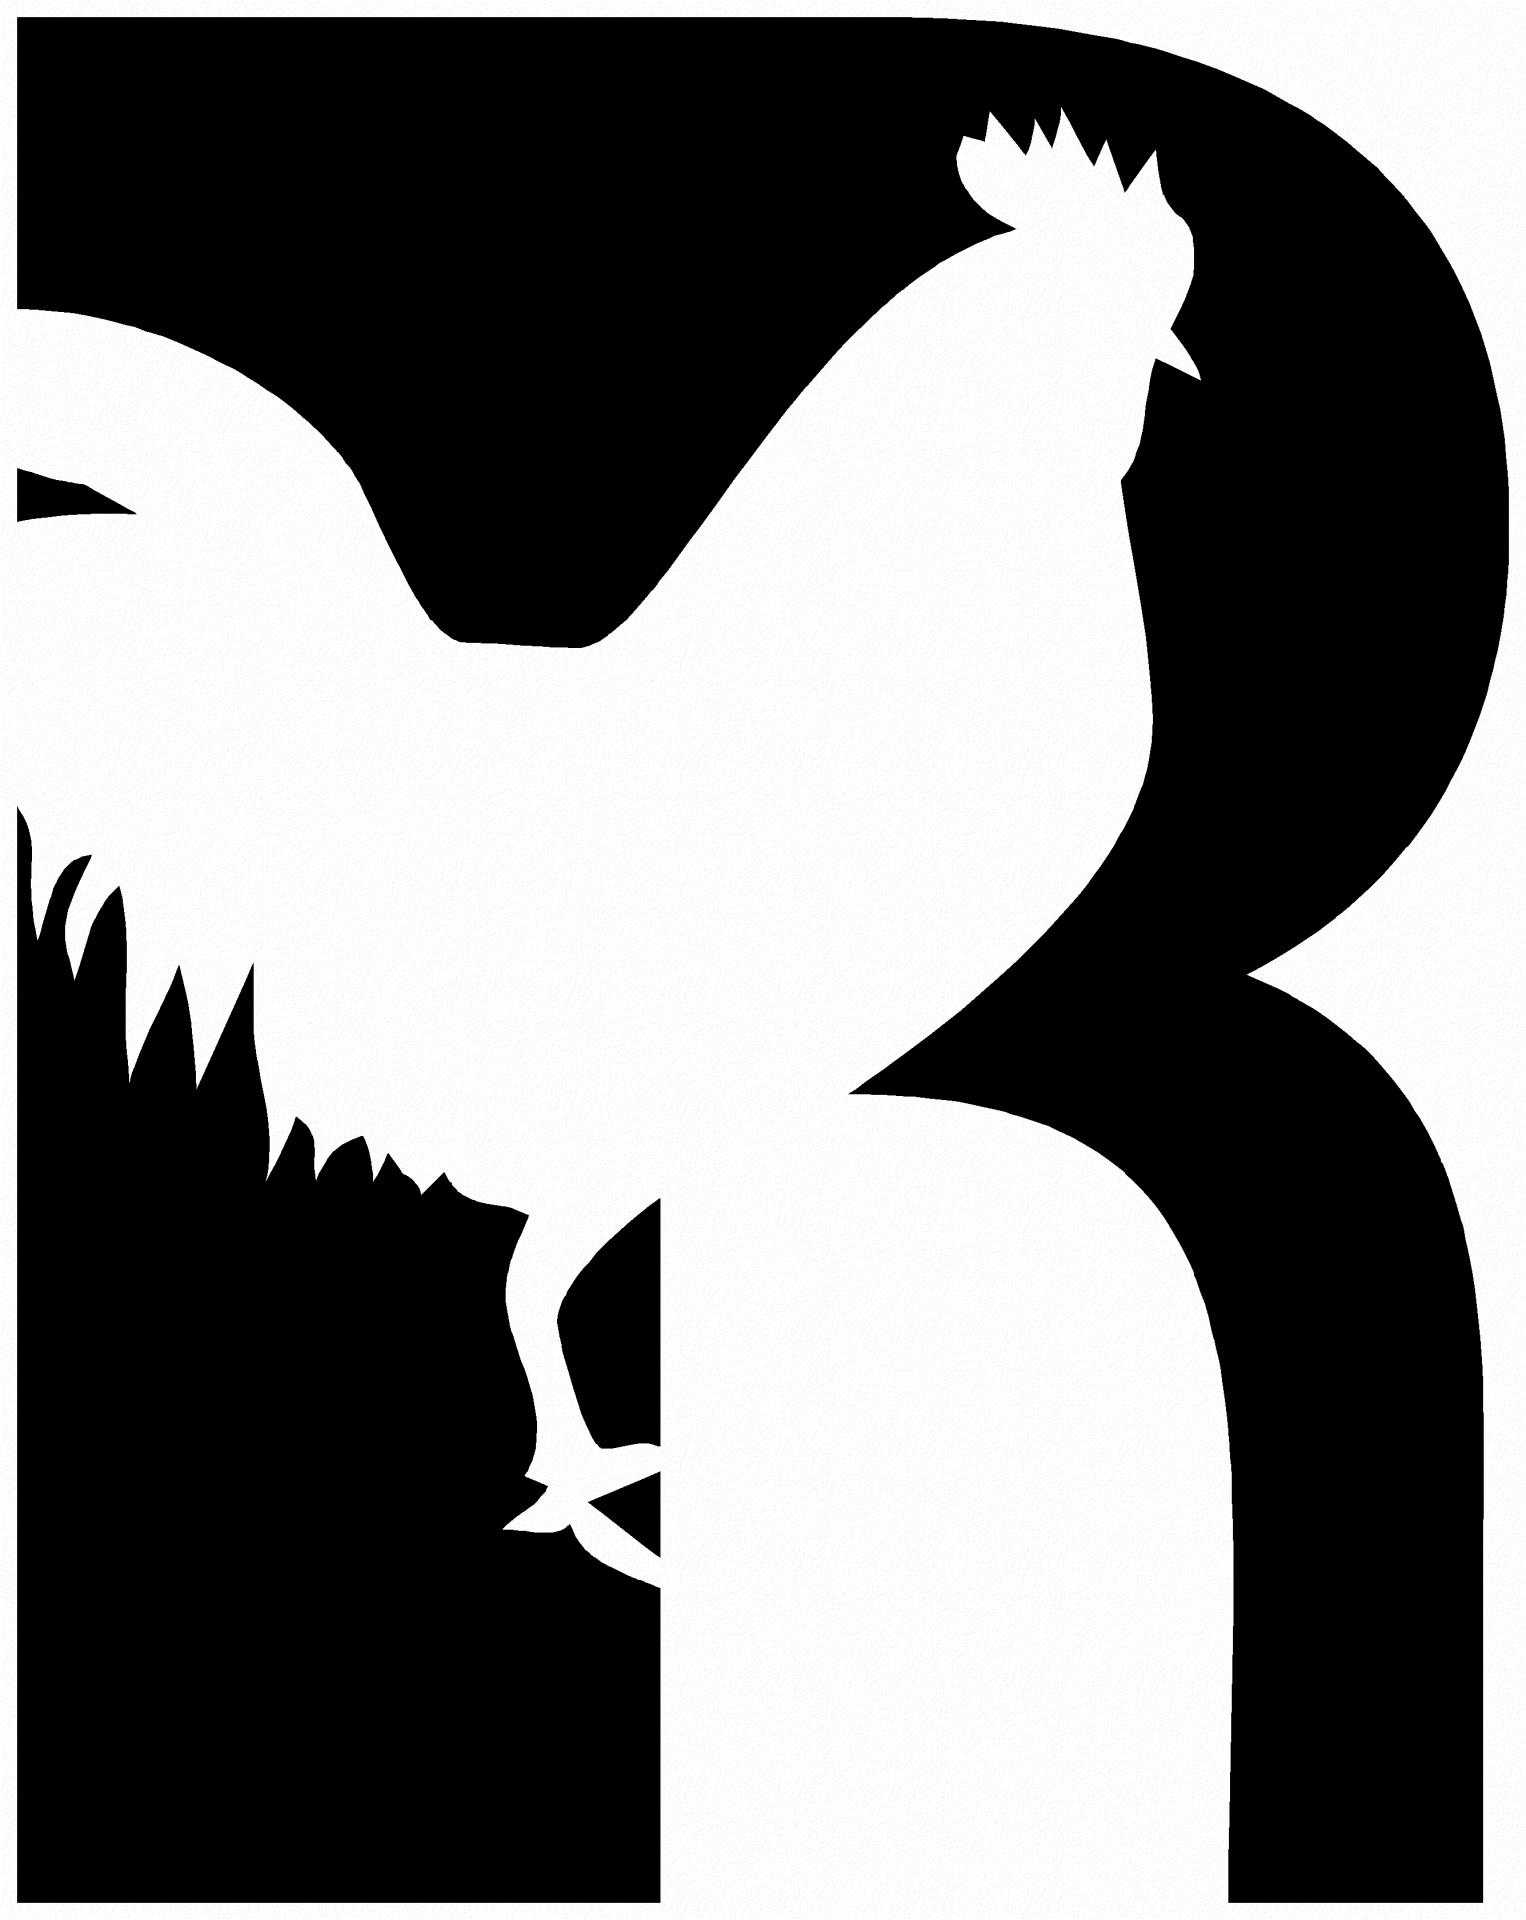 1526x1920 Alphabet Silhouette Letter R Free Stock Photo